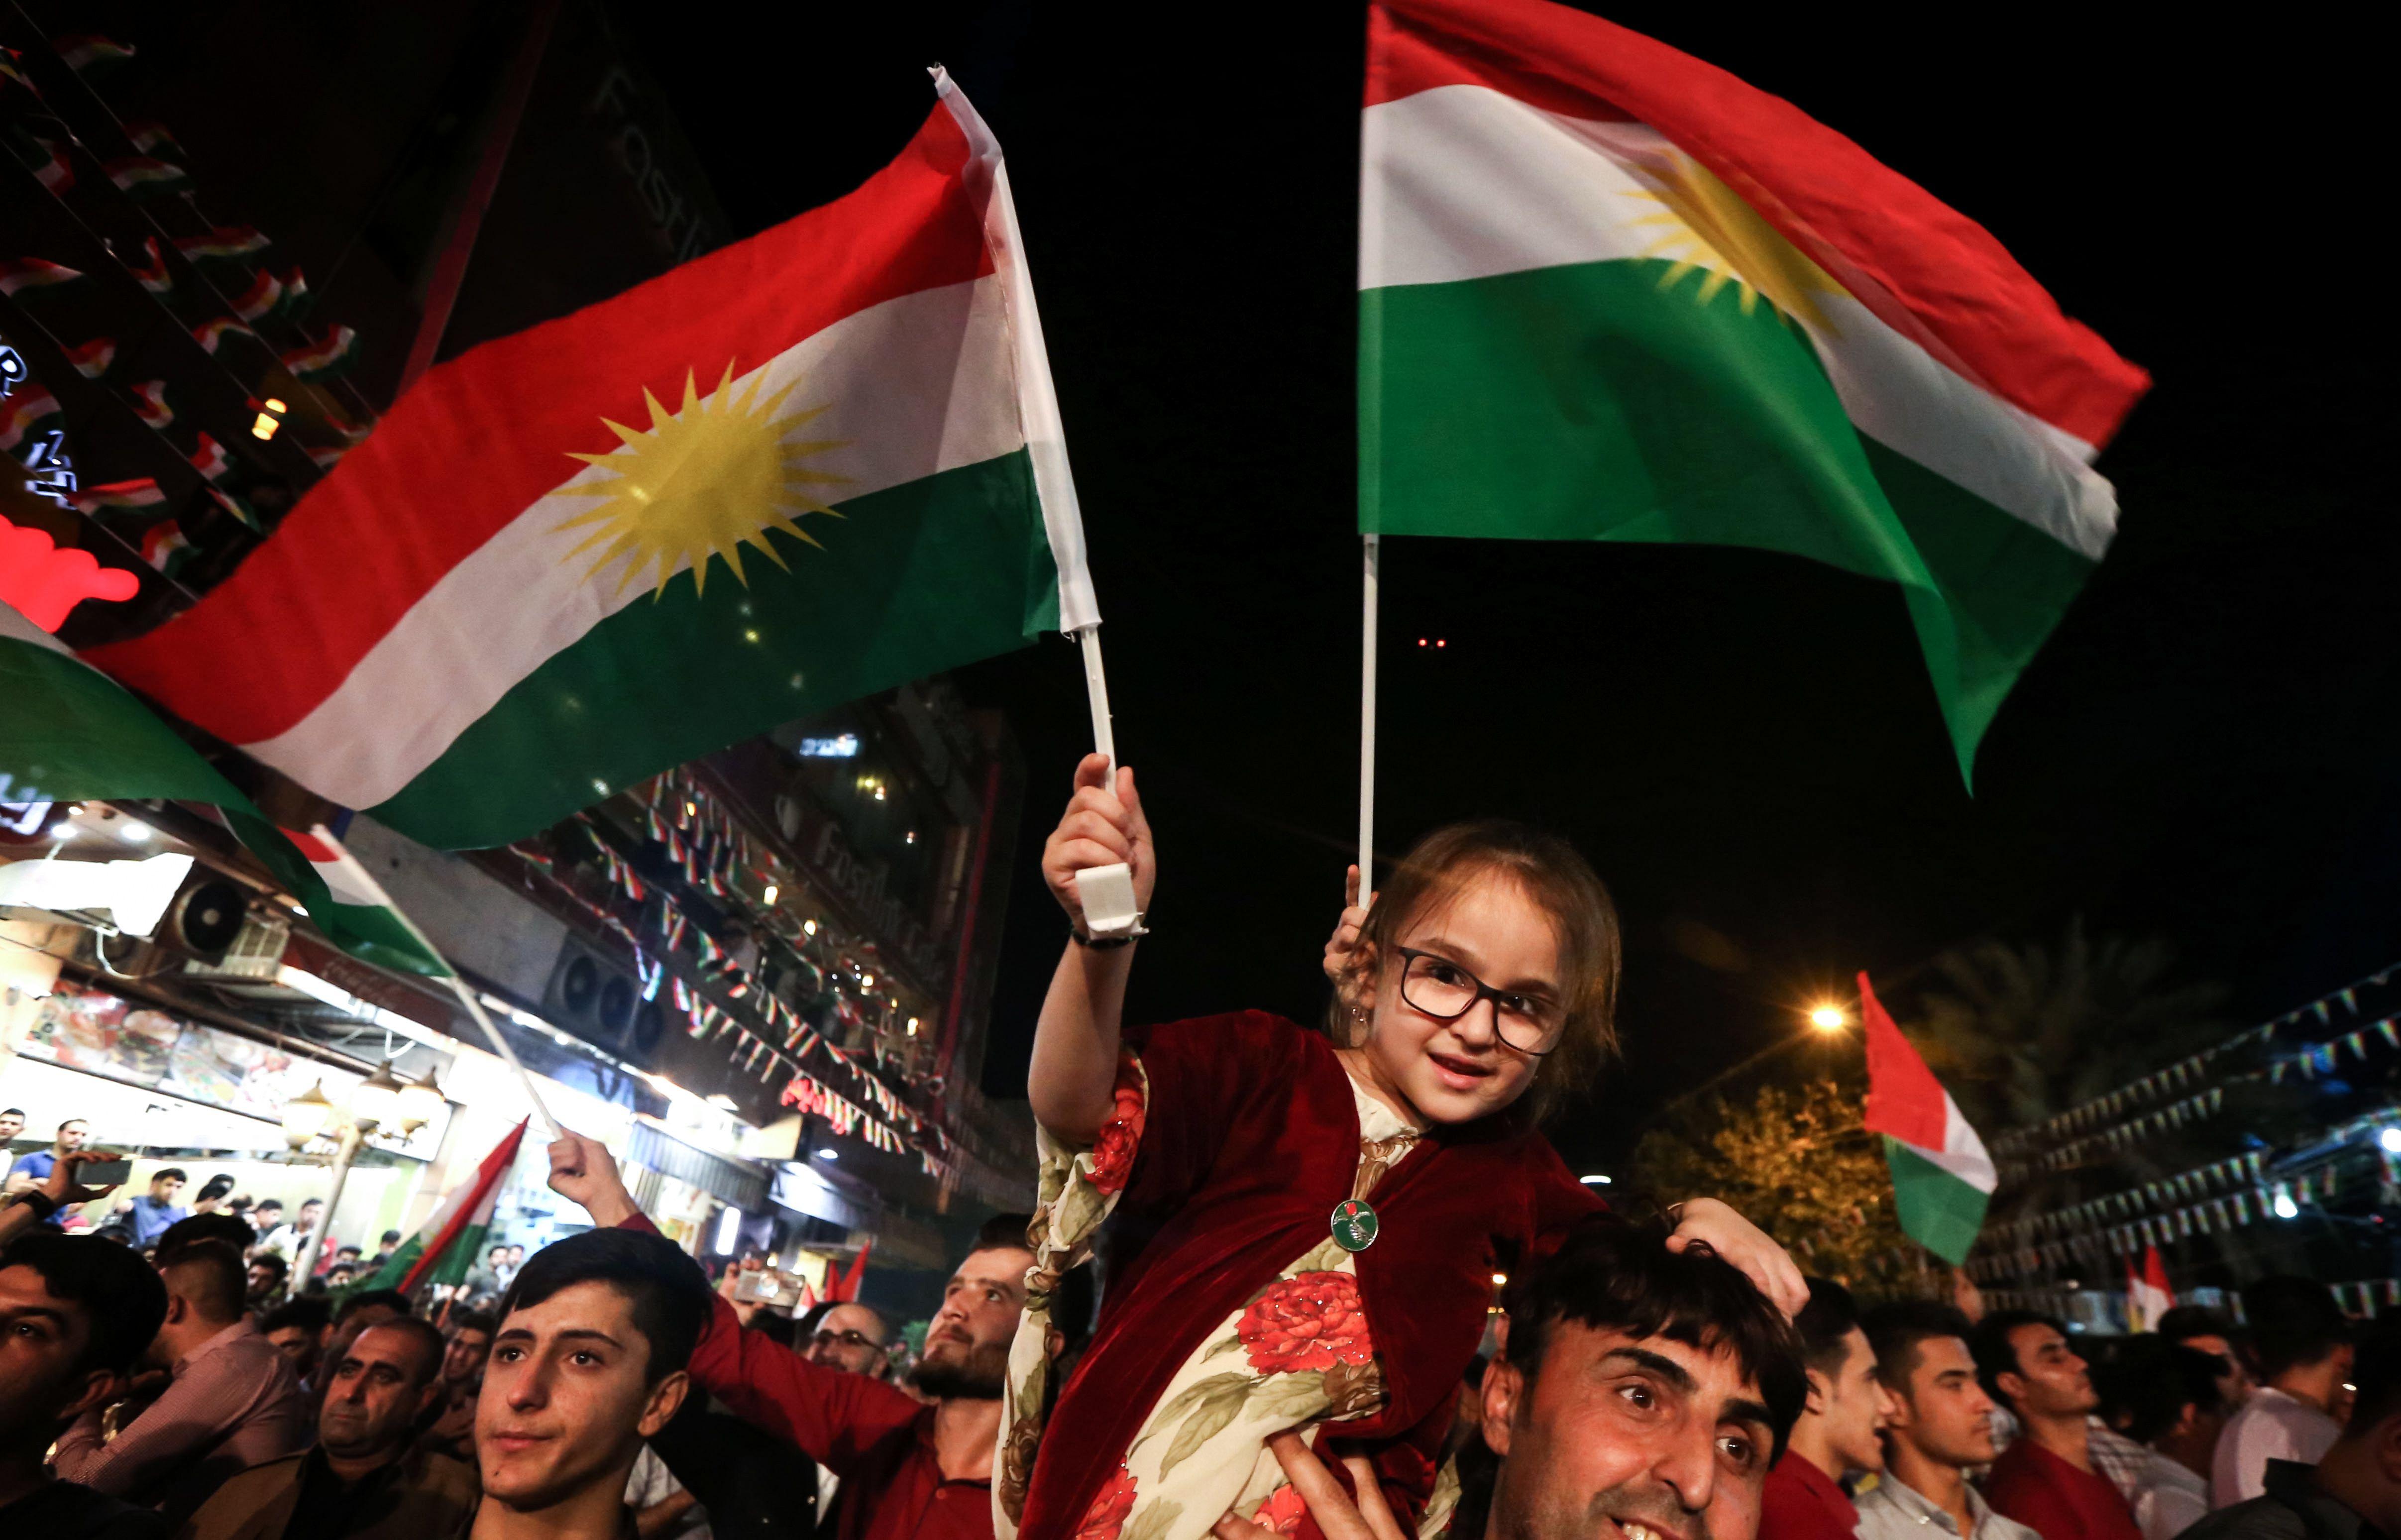 IRAQ-KURDS-POLITICS-REFERENDUM